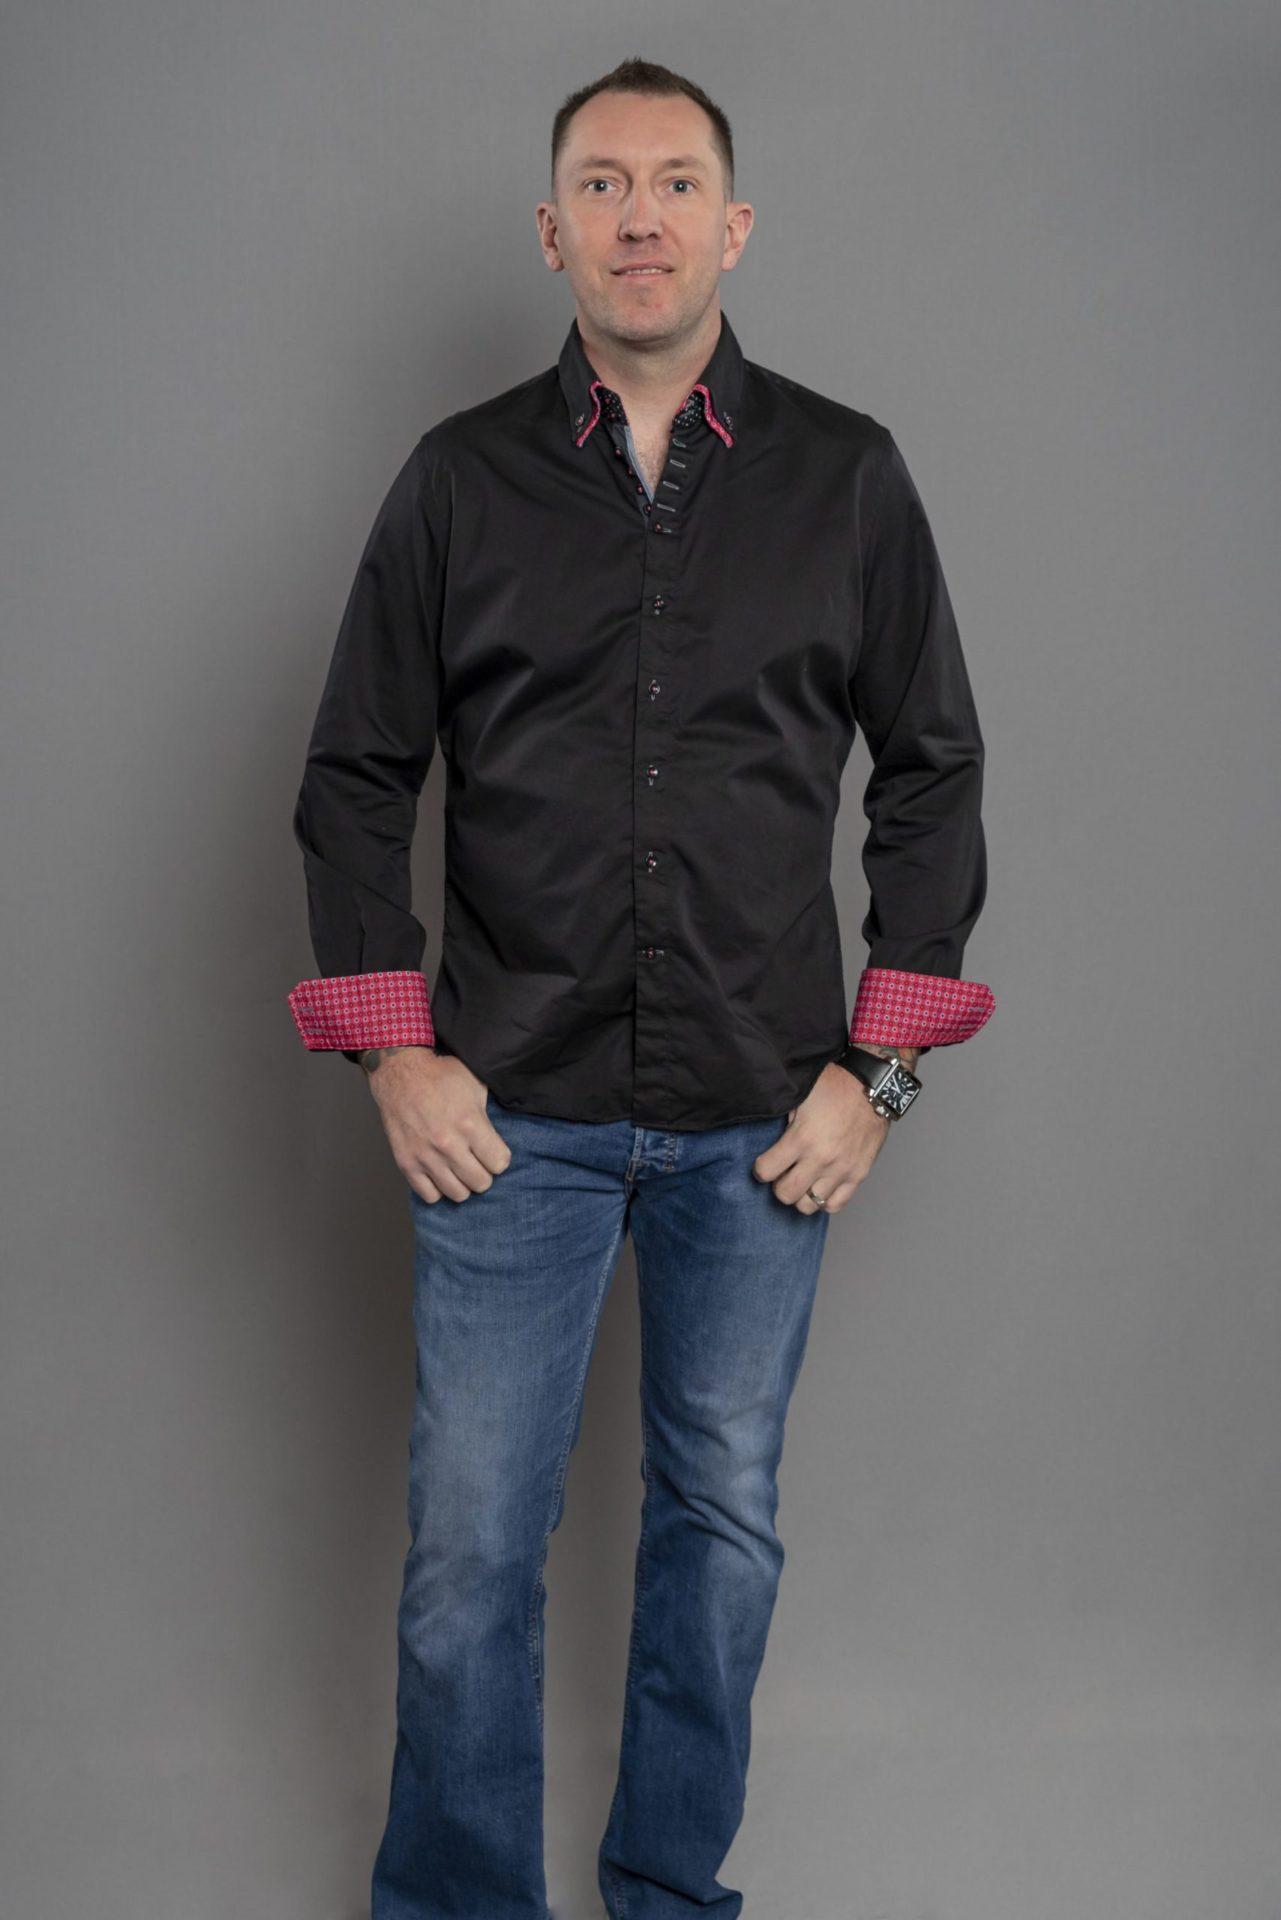 Ryan Kessler - Staff